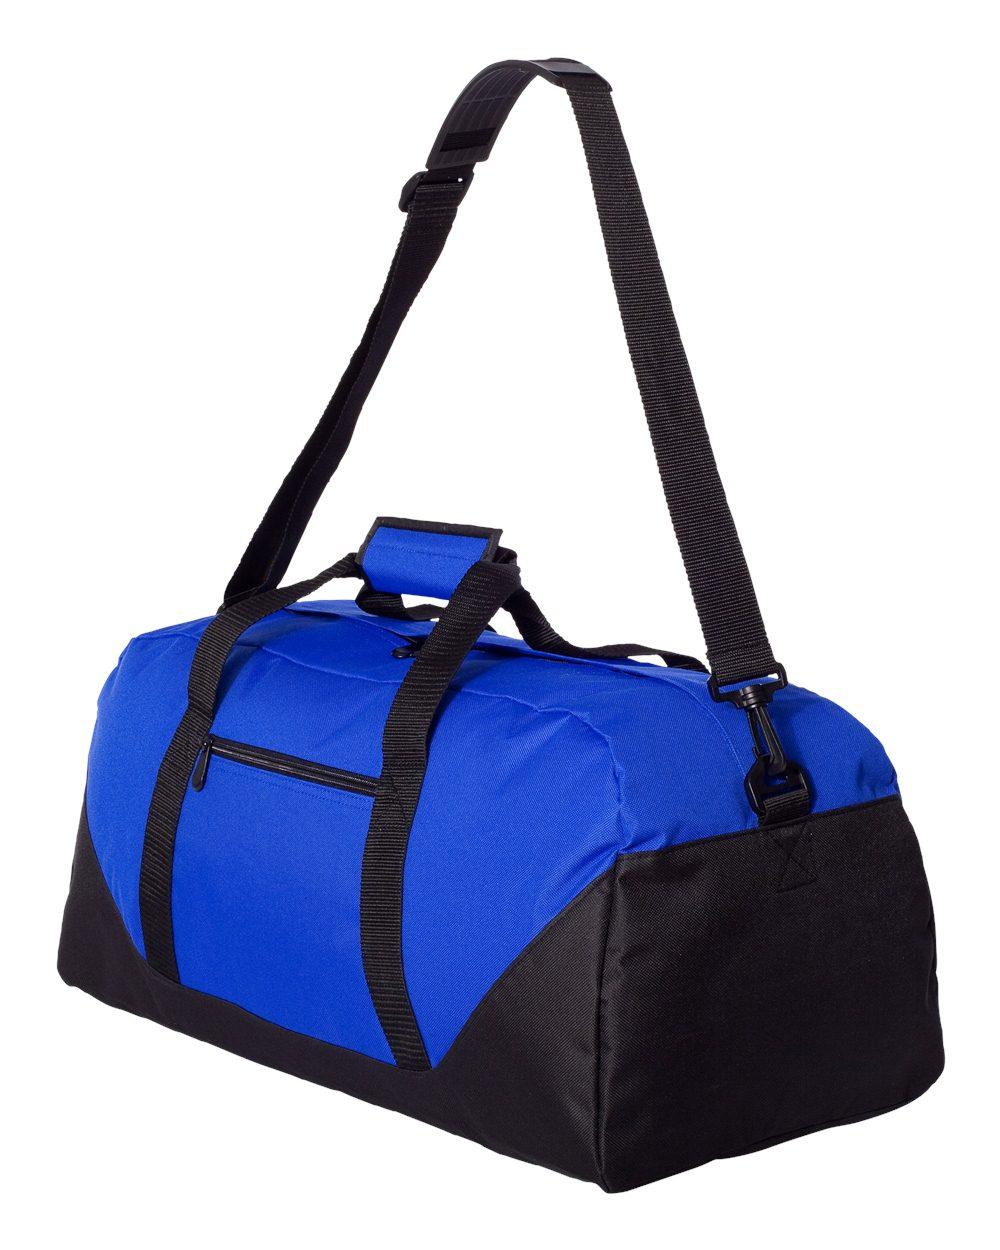 Liberty Bags Liberty Series 22 Inch Duffel - 2251